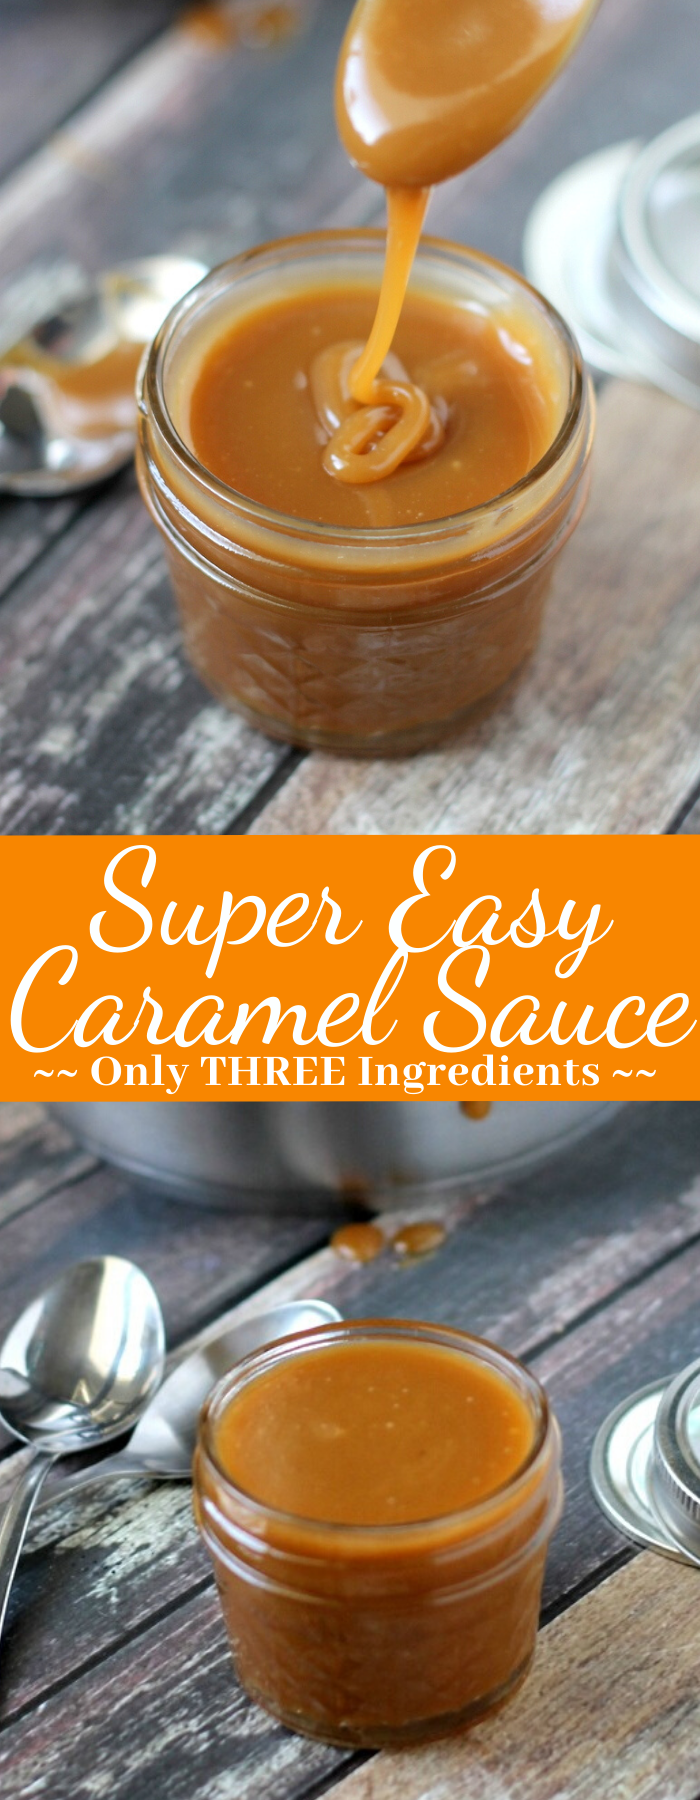 Super Easy Caramel Sauce (3 ingredients)